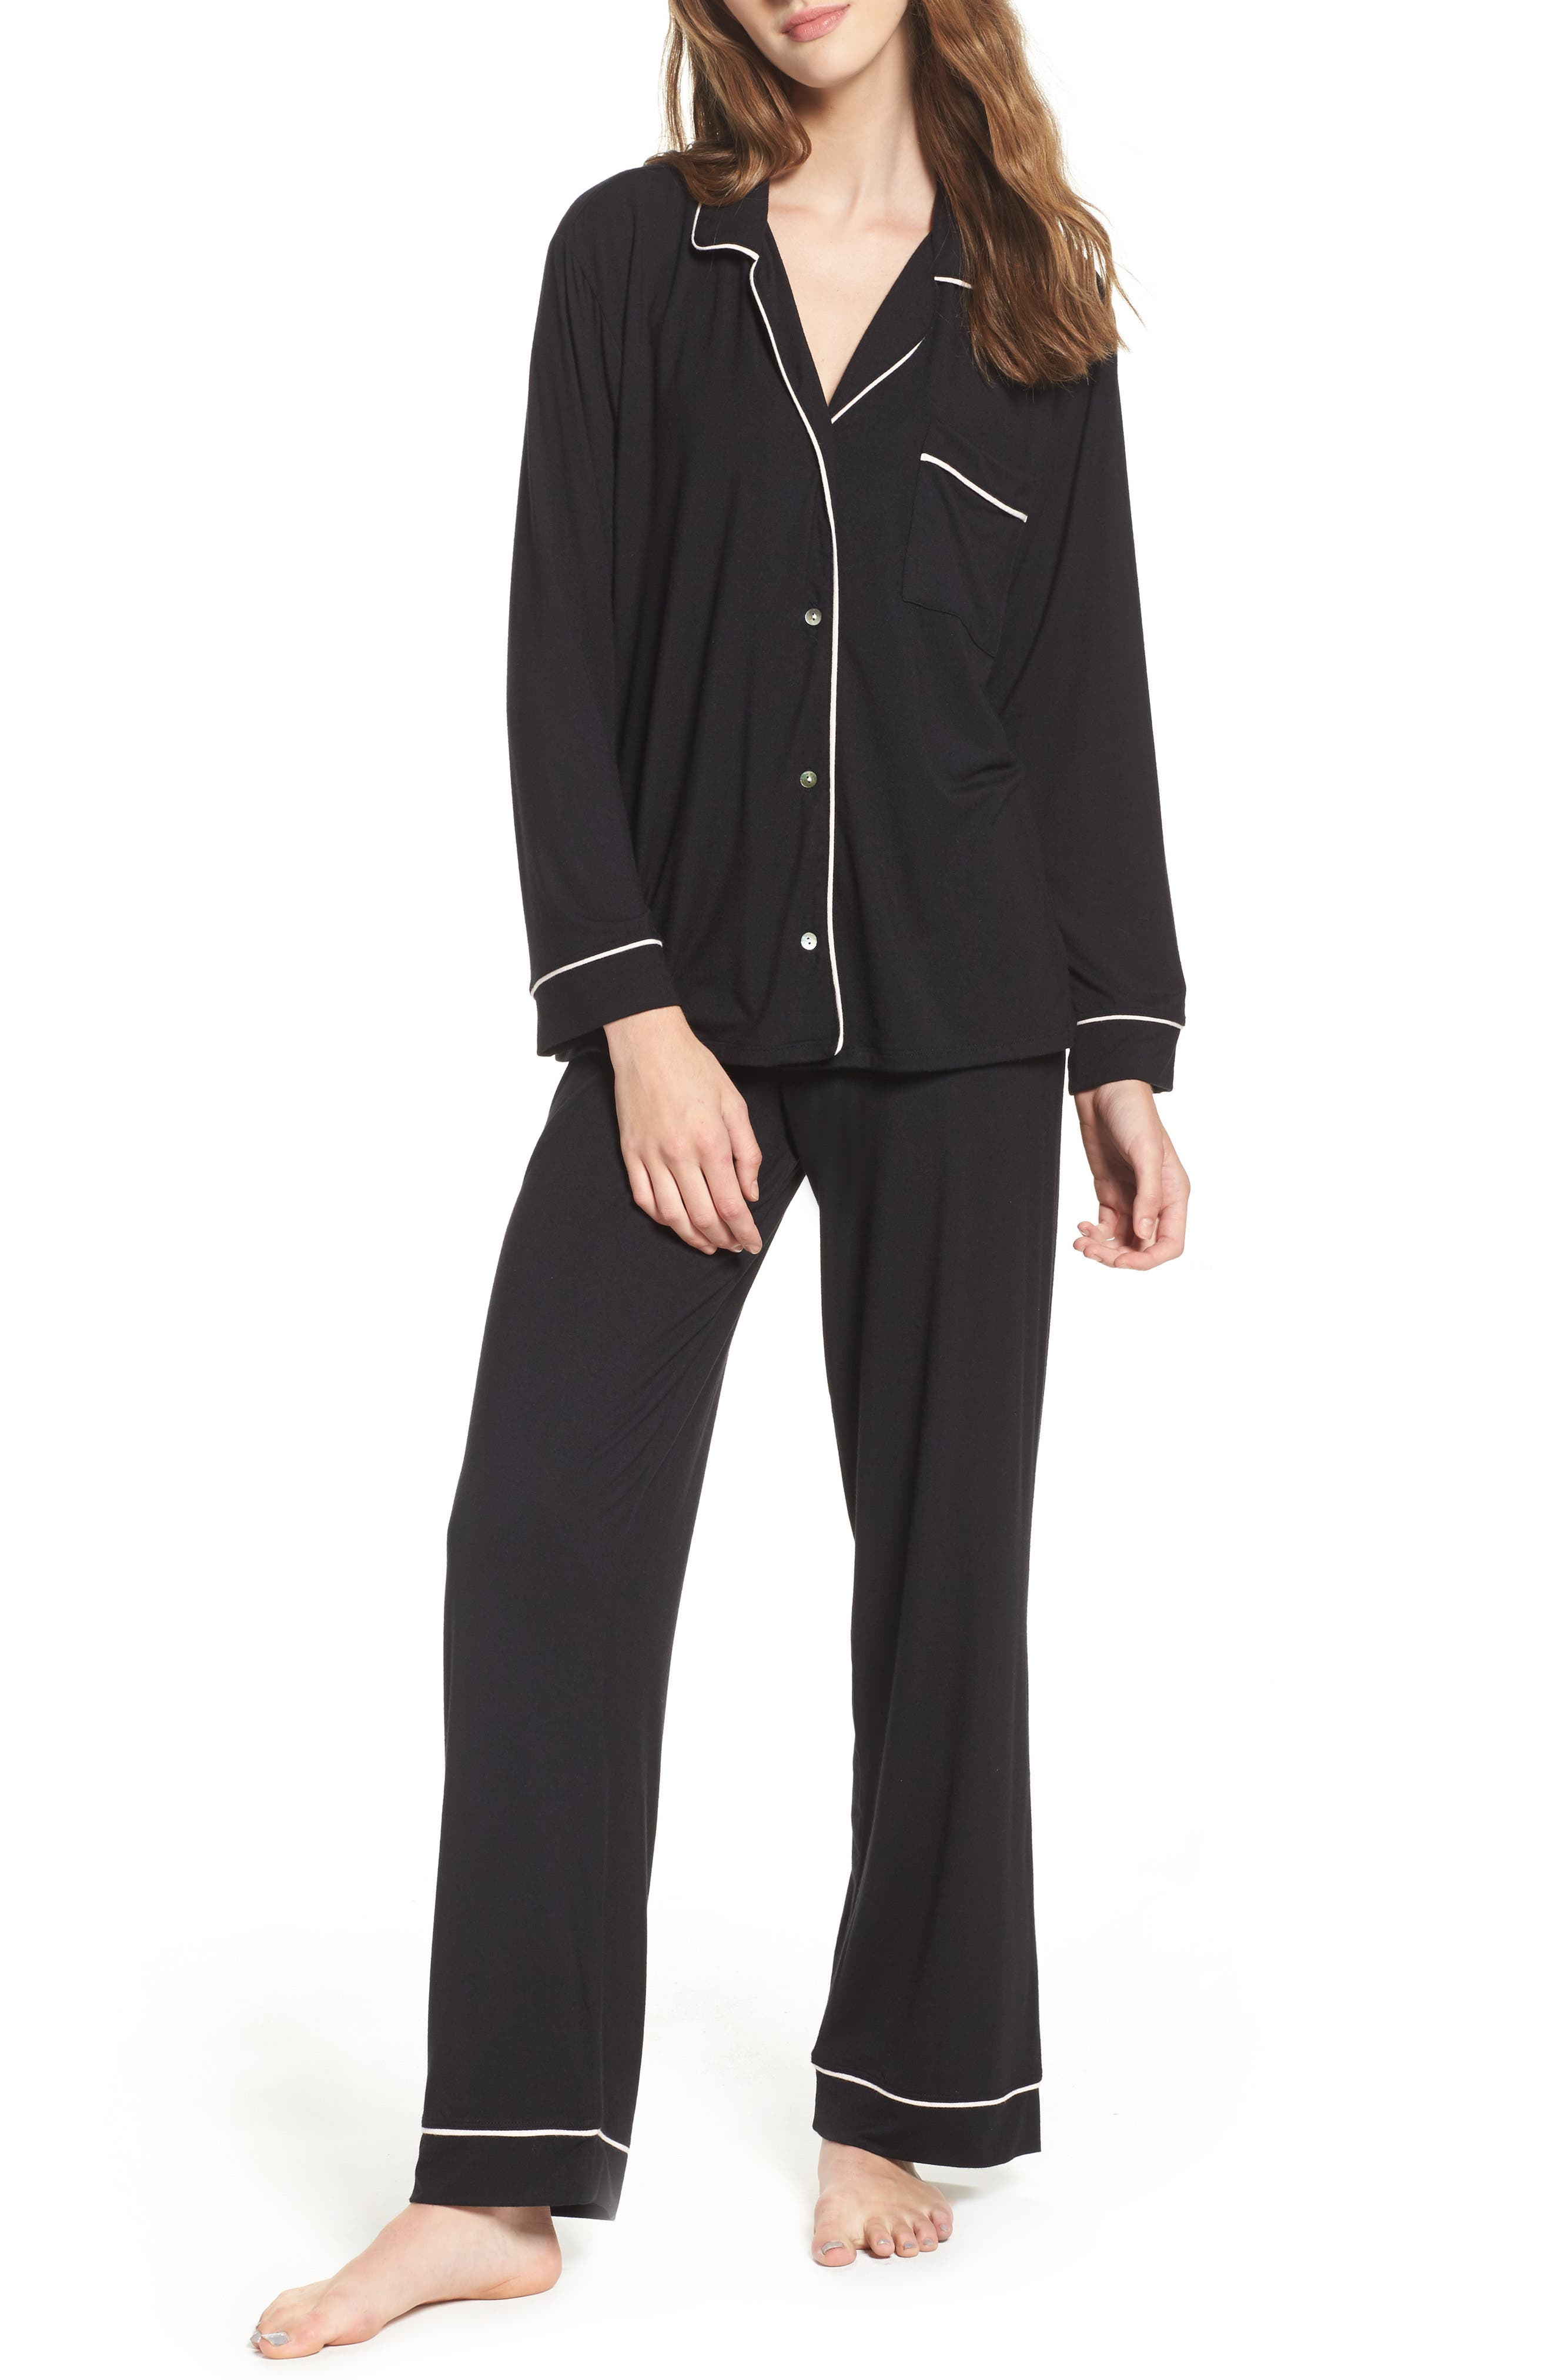 'Giselle' Pajamas,                         Main,                         color, Black/ Sorbet Pink